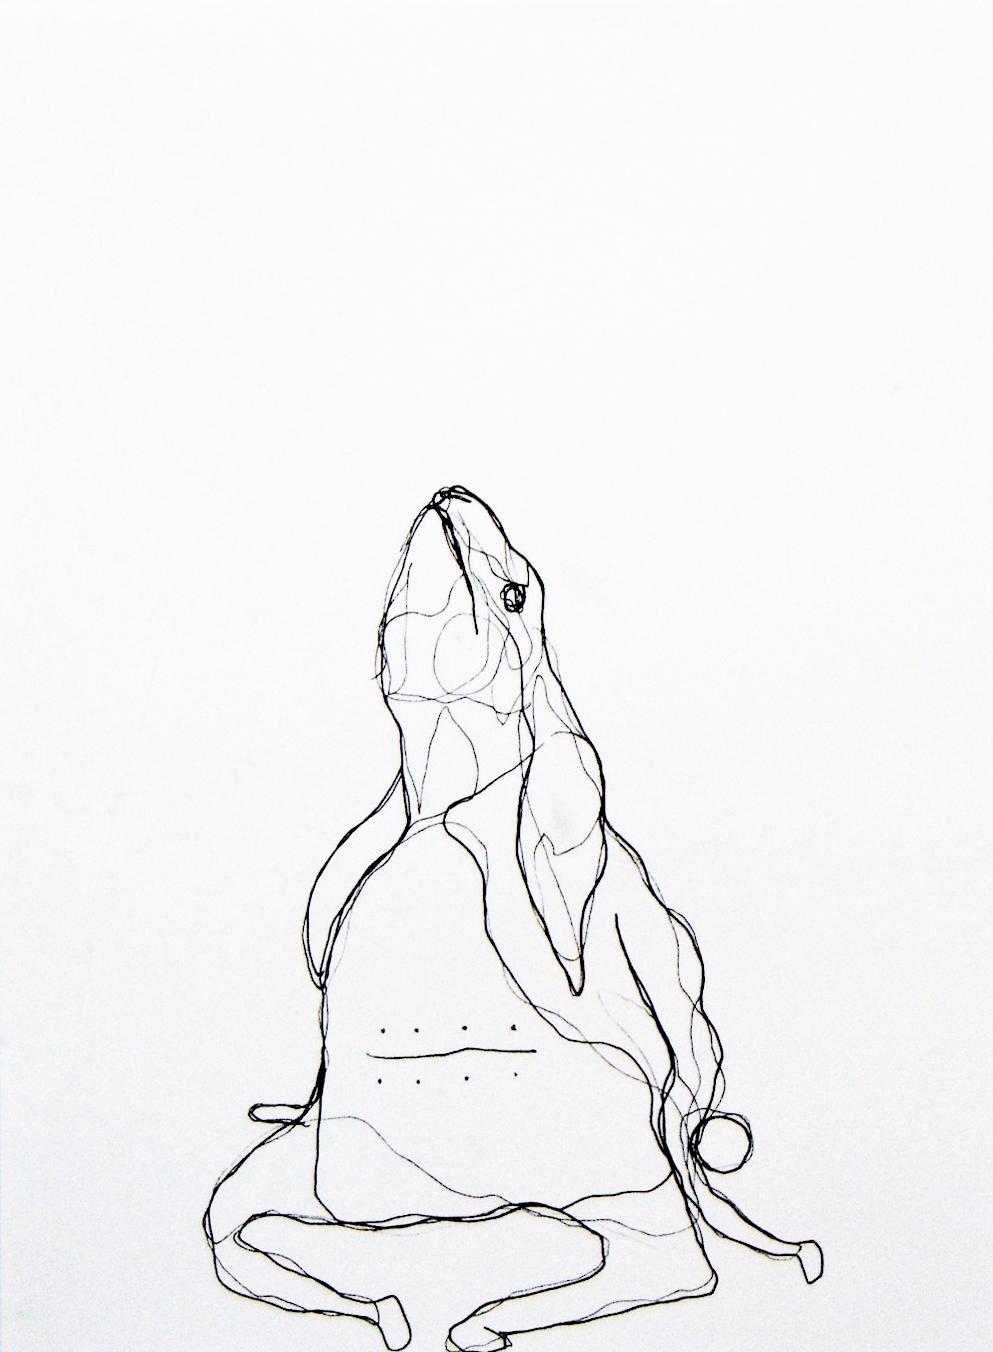 "Kate Donovan , Damned , Pen on Paper, 8 x 11"", 2017"